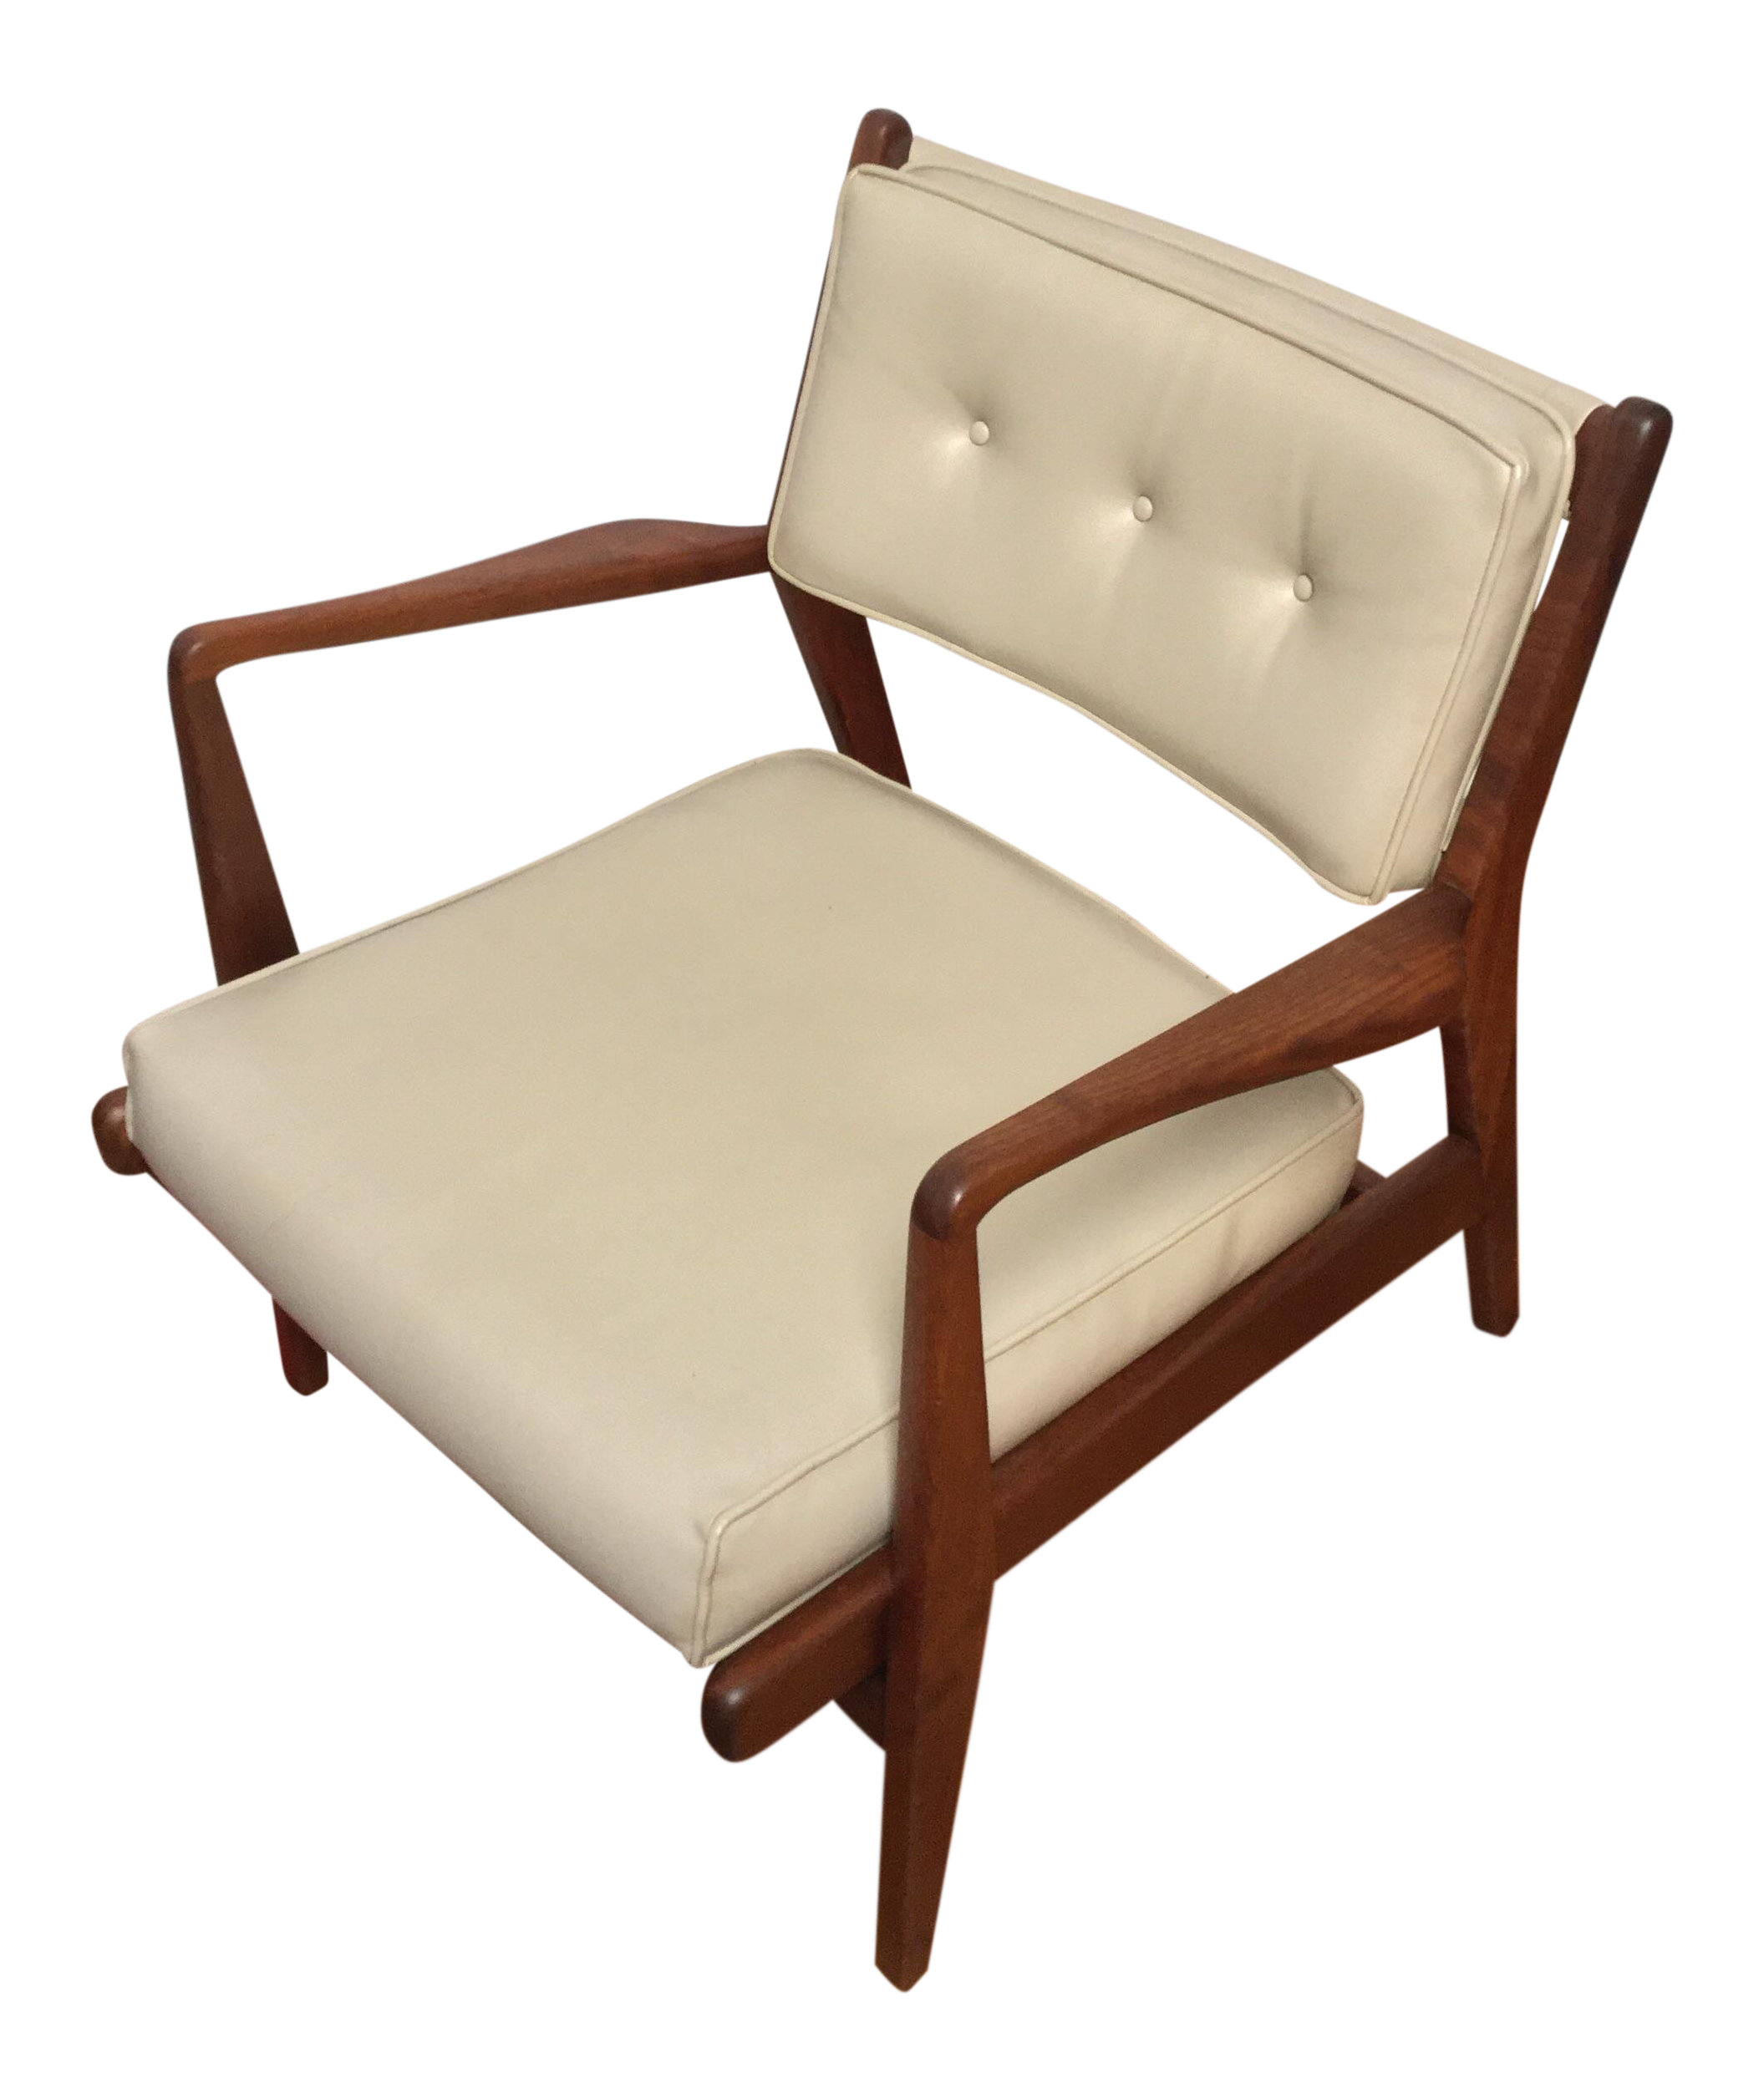 20th Century Scandinavian Modern Jens Risom Walnut Low Lounge Chair |  Chairish